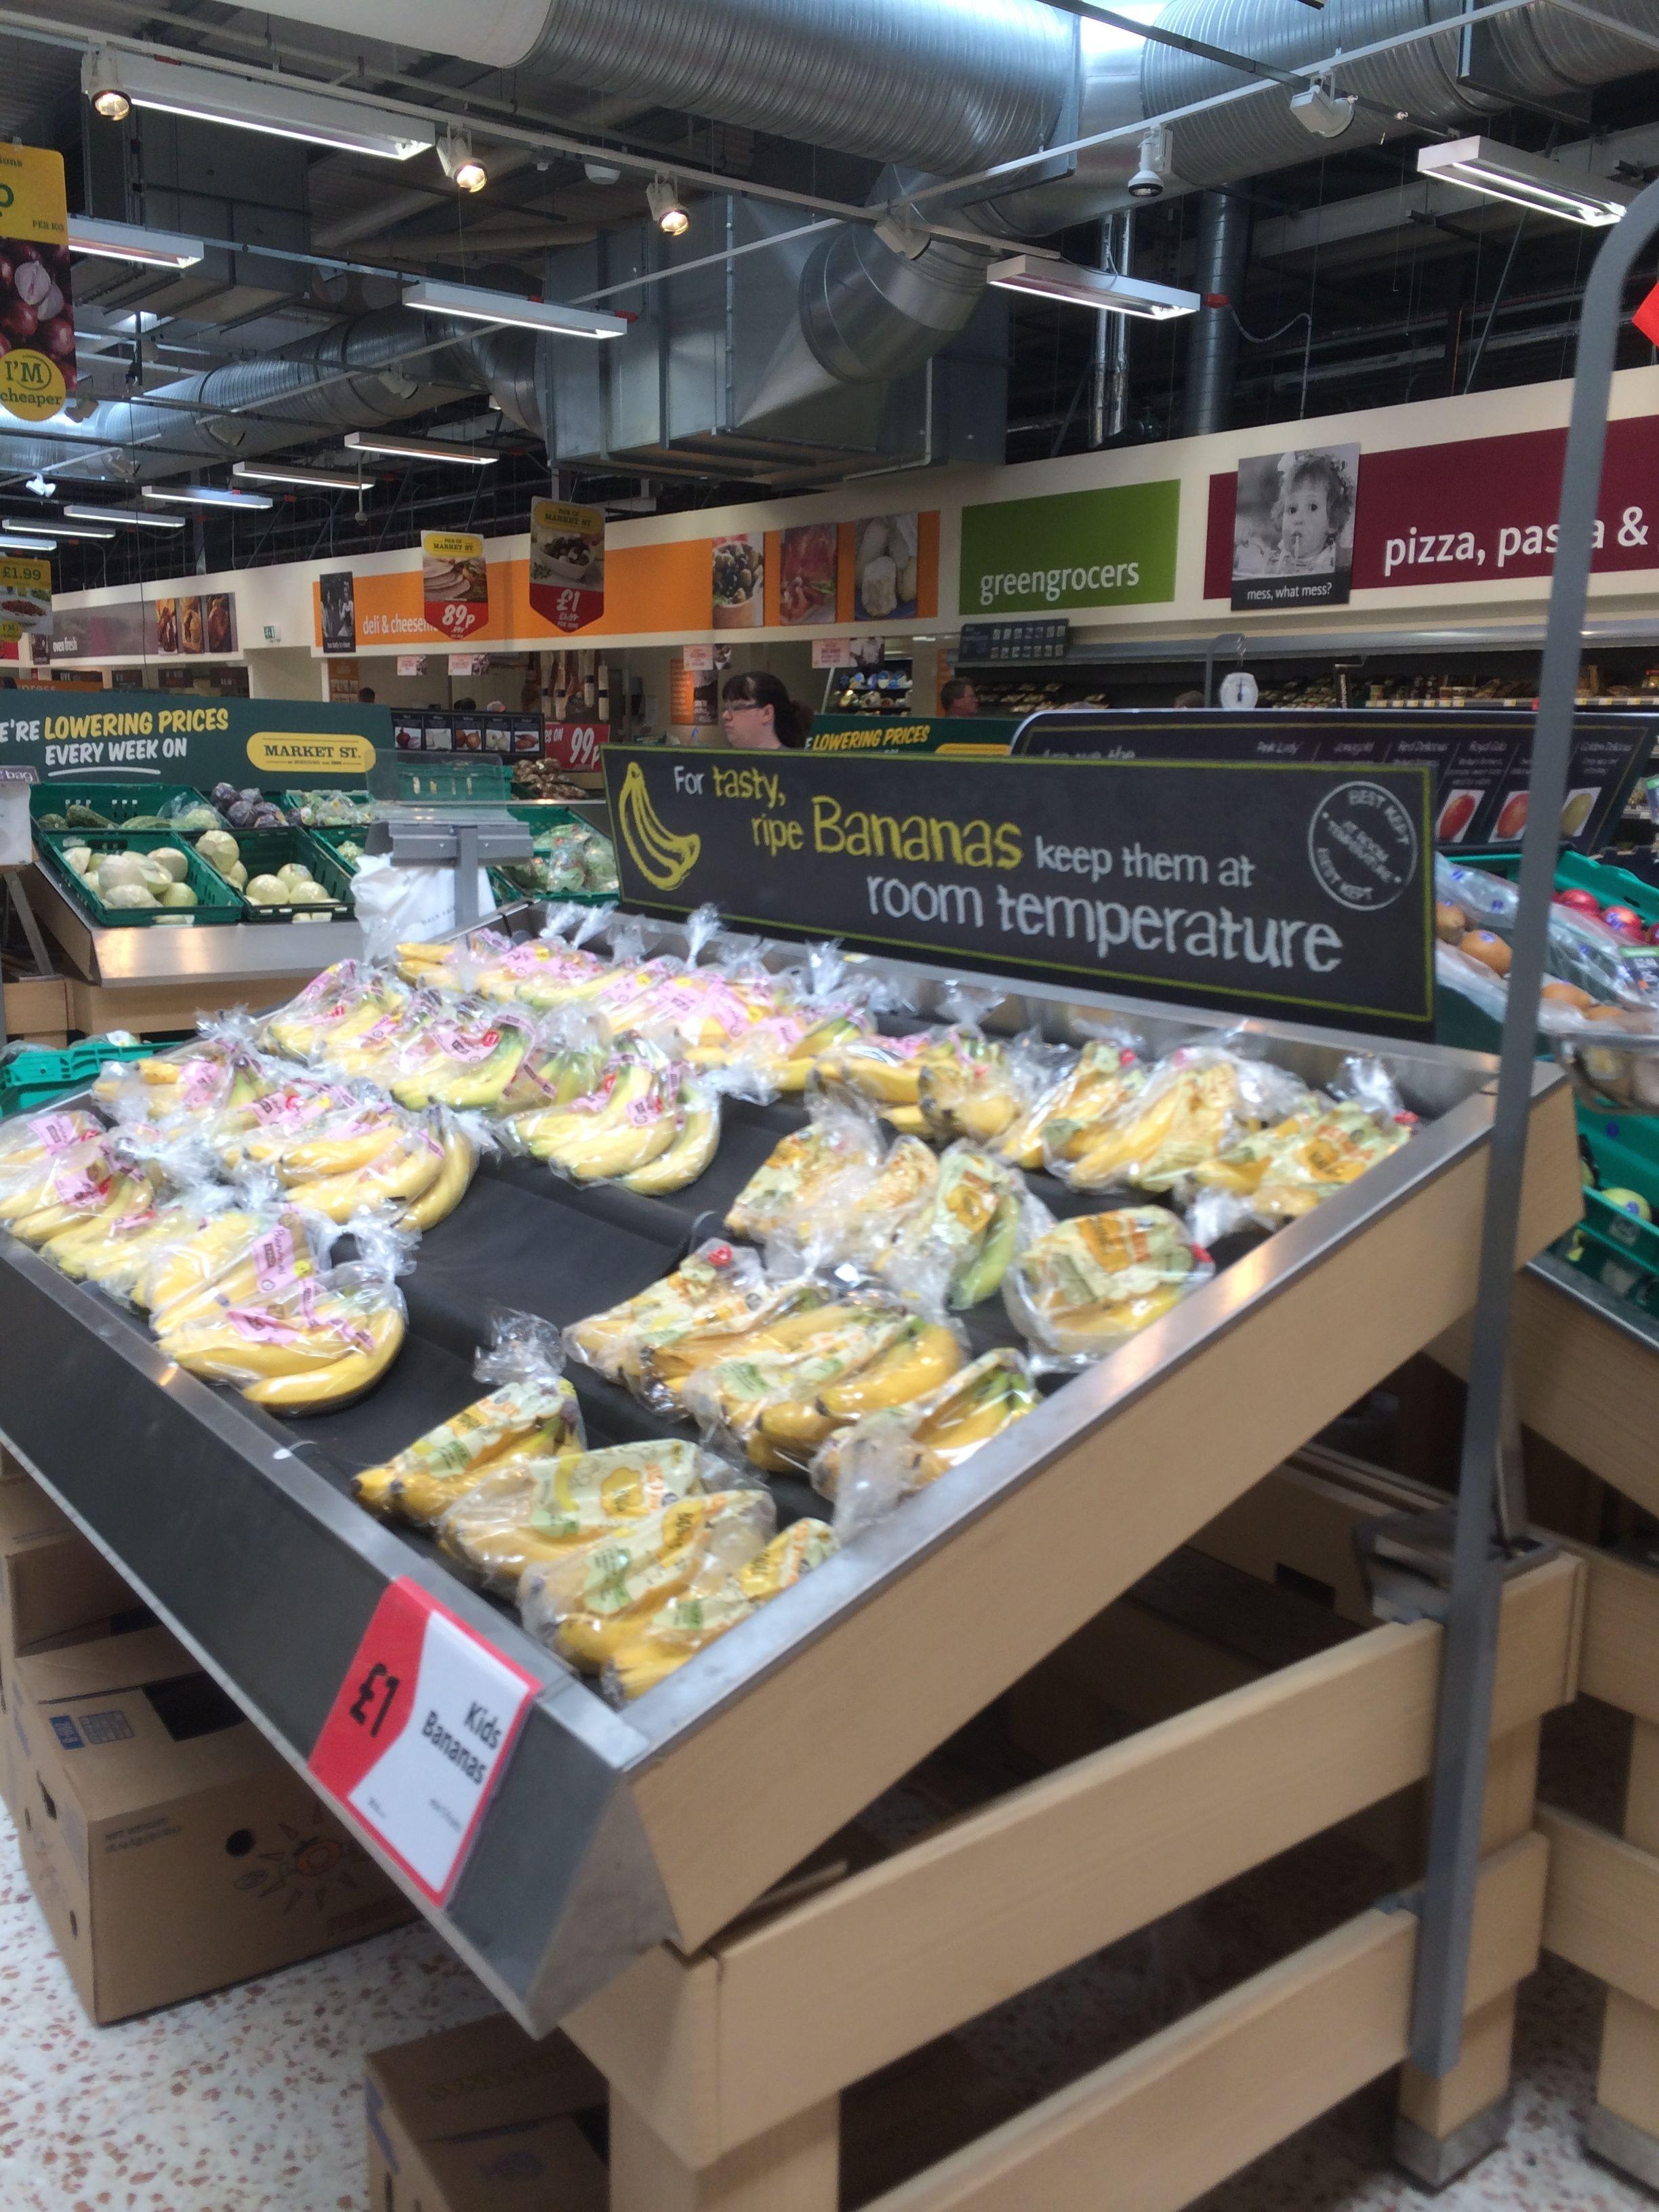 Morrisons Eastbourne Food Supermarket Grocery Layout Landscape Customer Journey Visual Merchandising Www Clear Food Morrisons Tasty